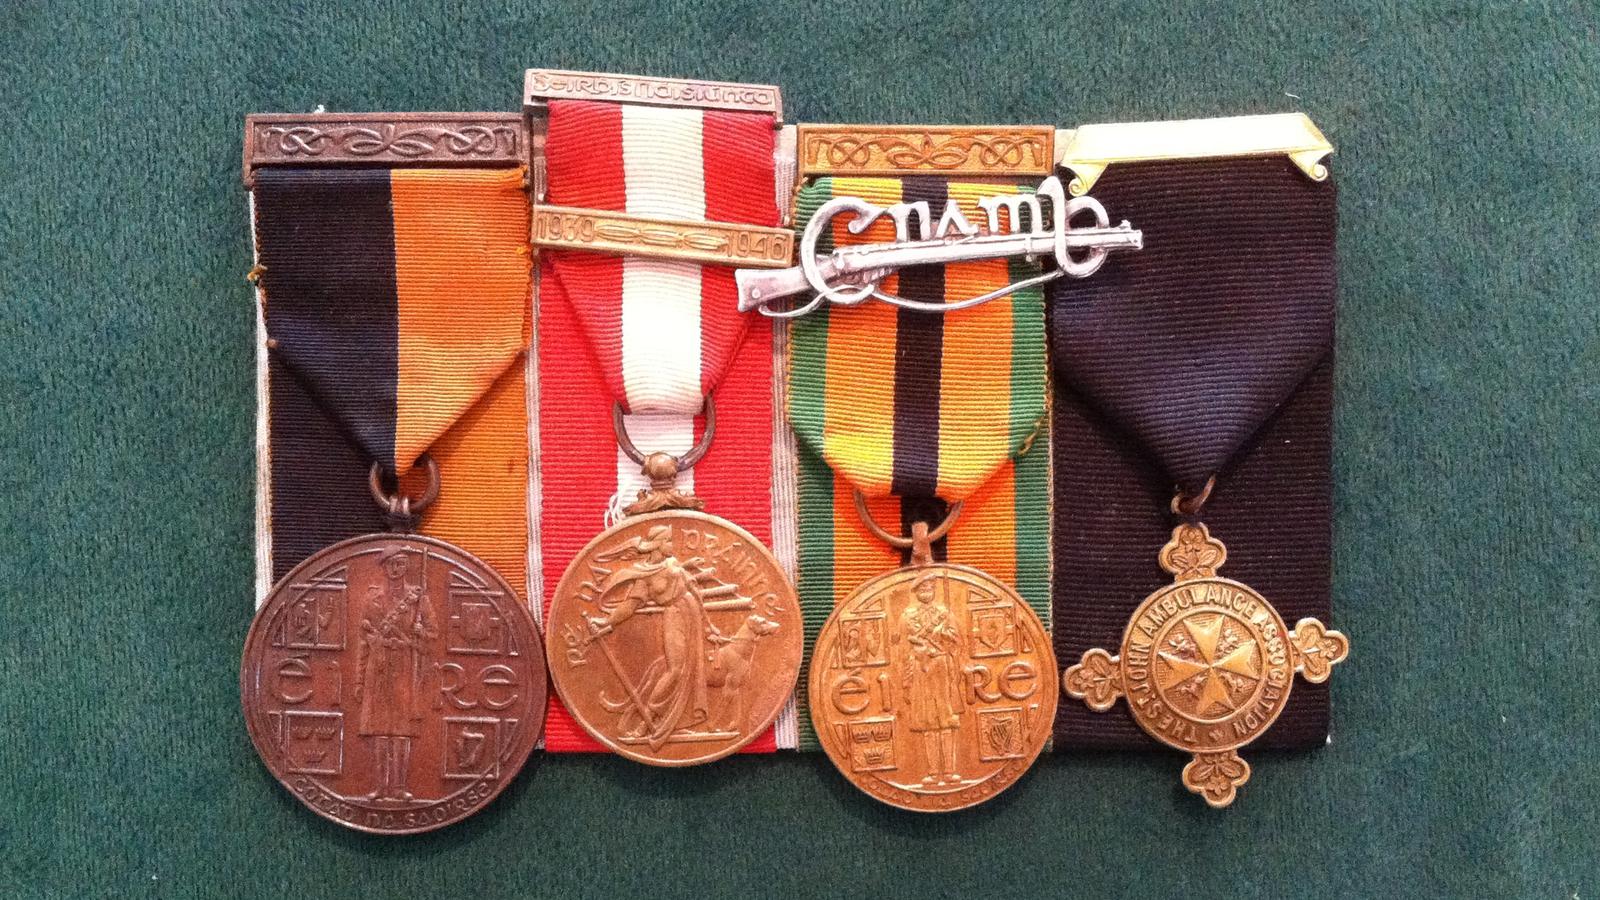 Image - A Cumann na mBan veteran's medal, courtesy of Glasnevin Cemetery